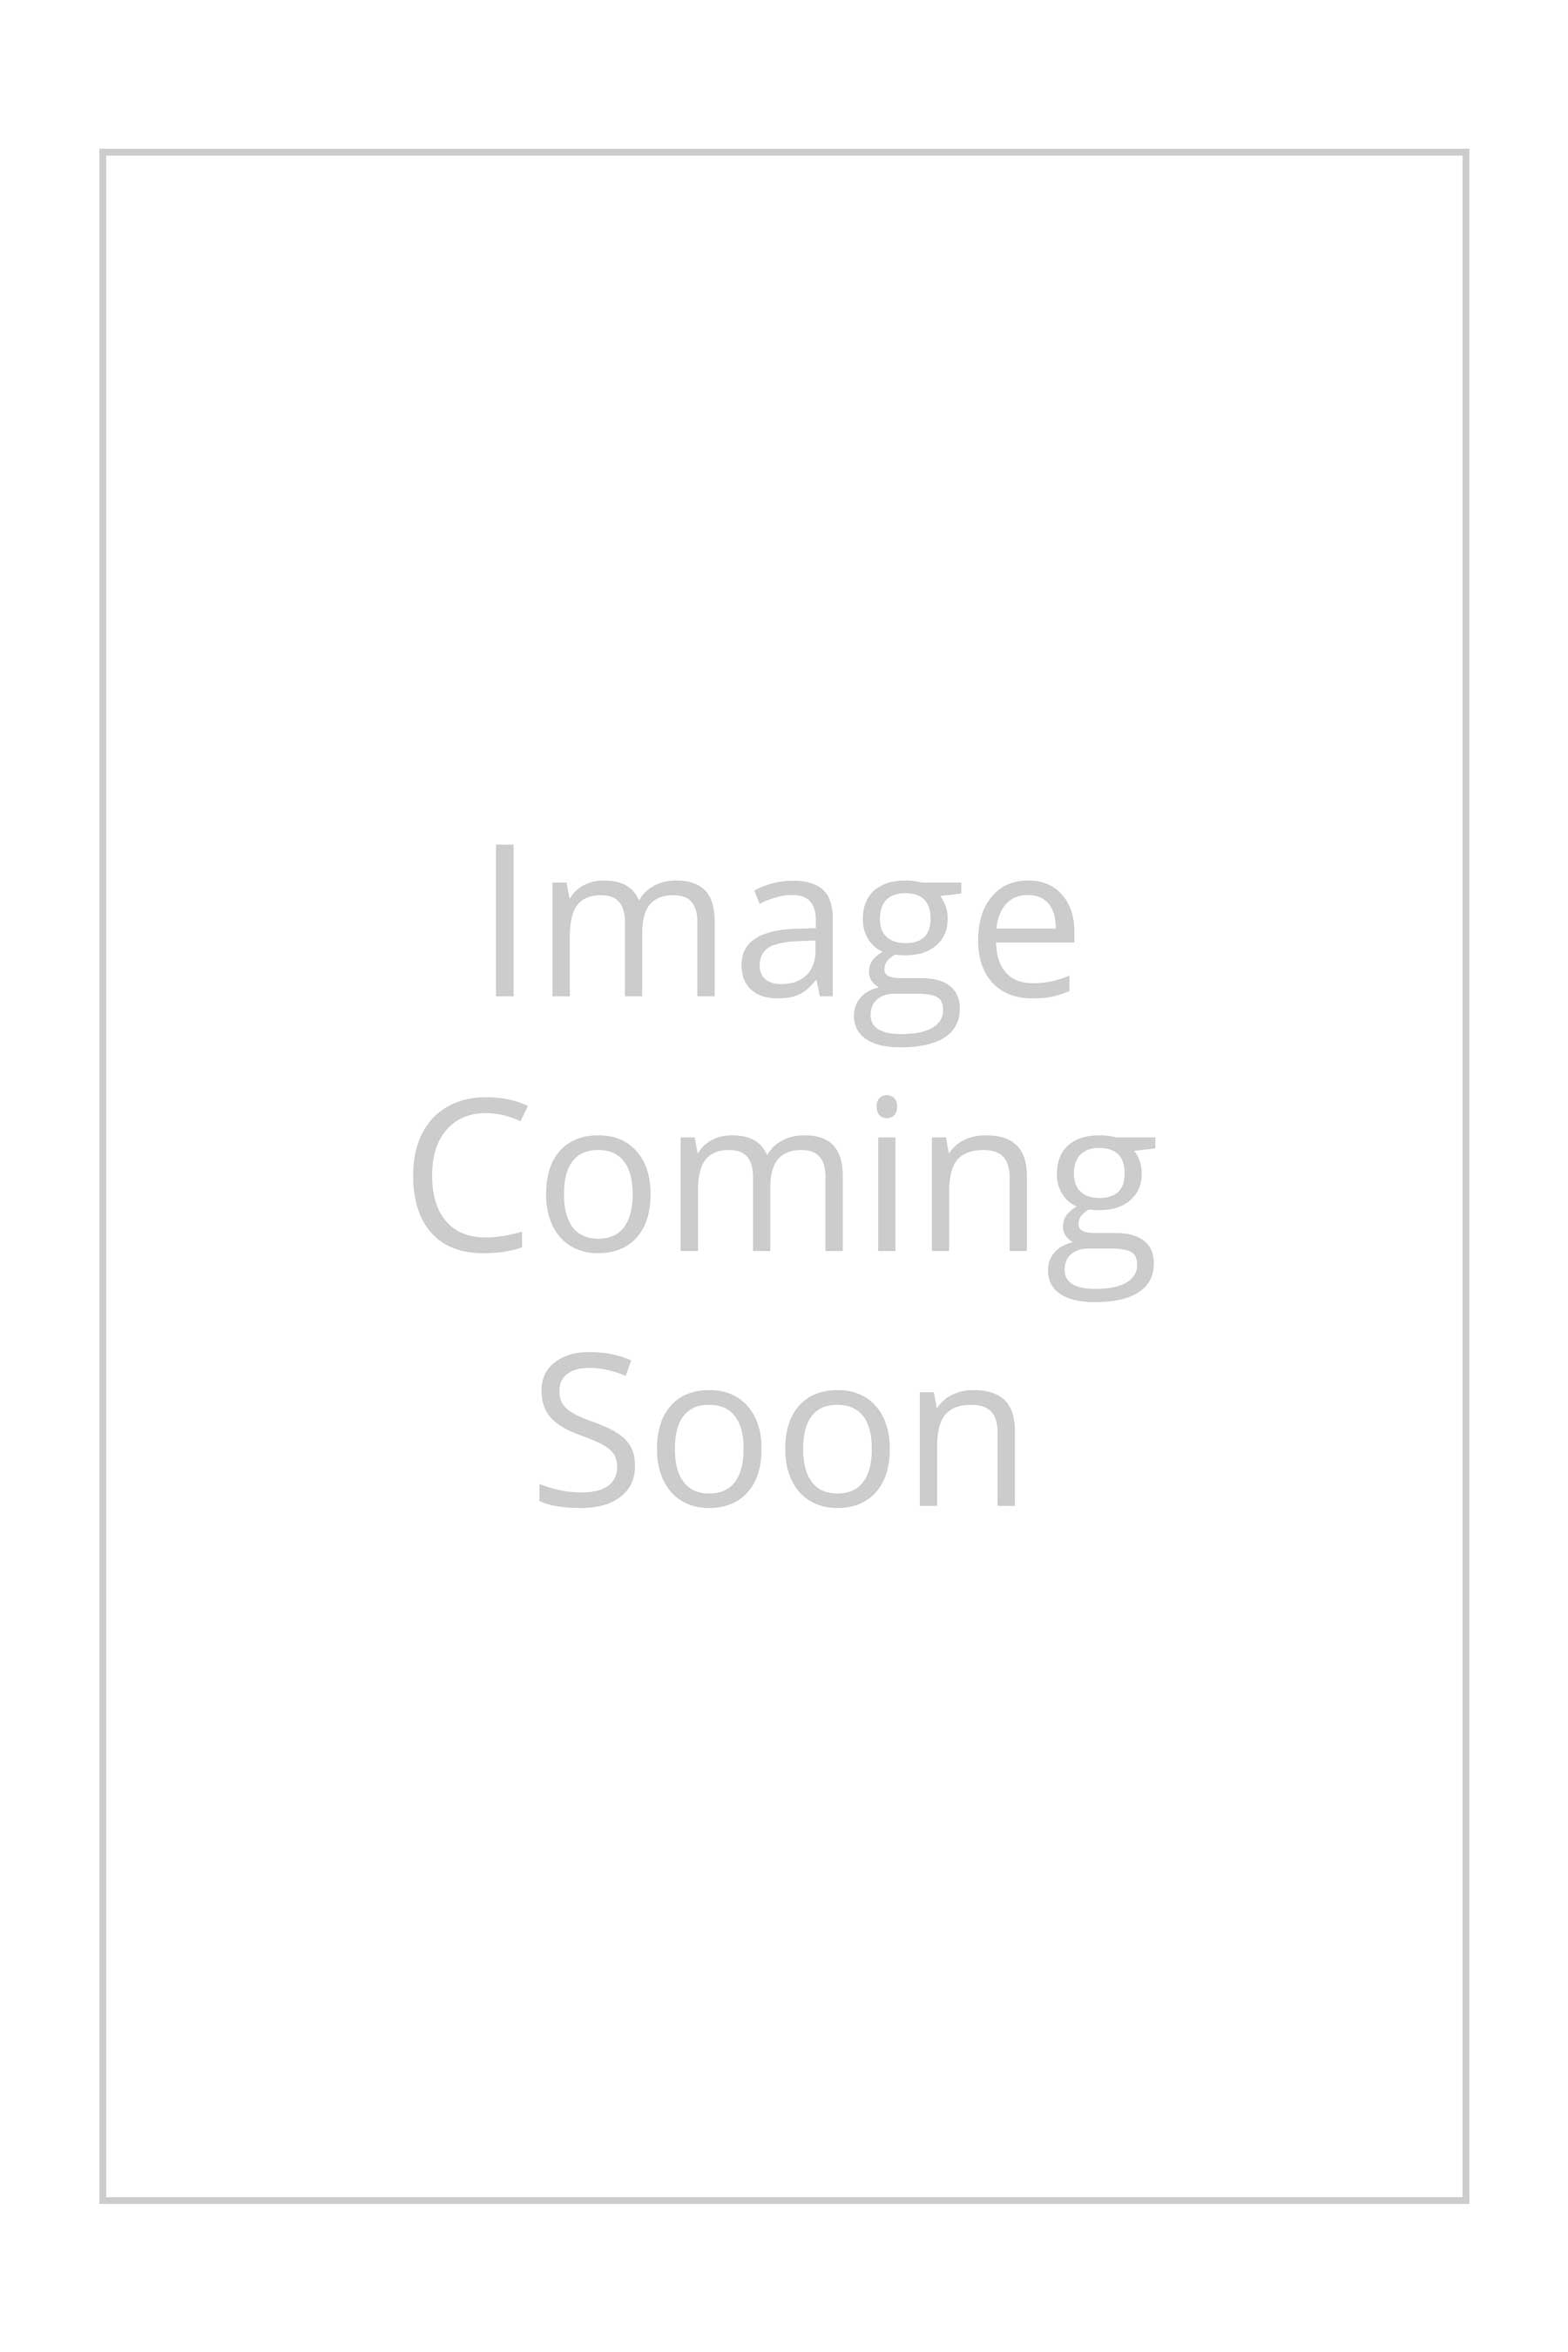 St John Ribbed Scoop Neck Santana Knit Top in Off-White